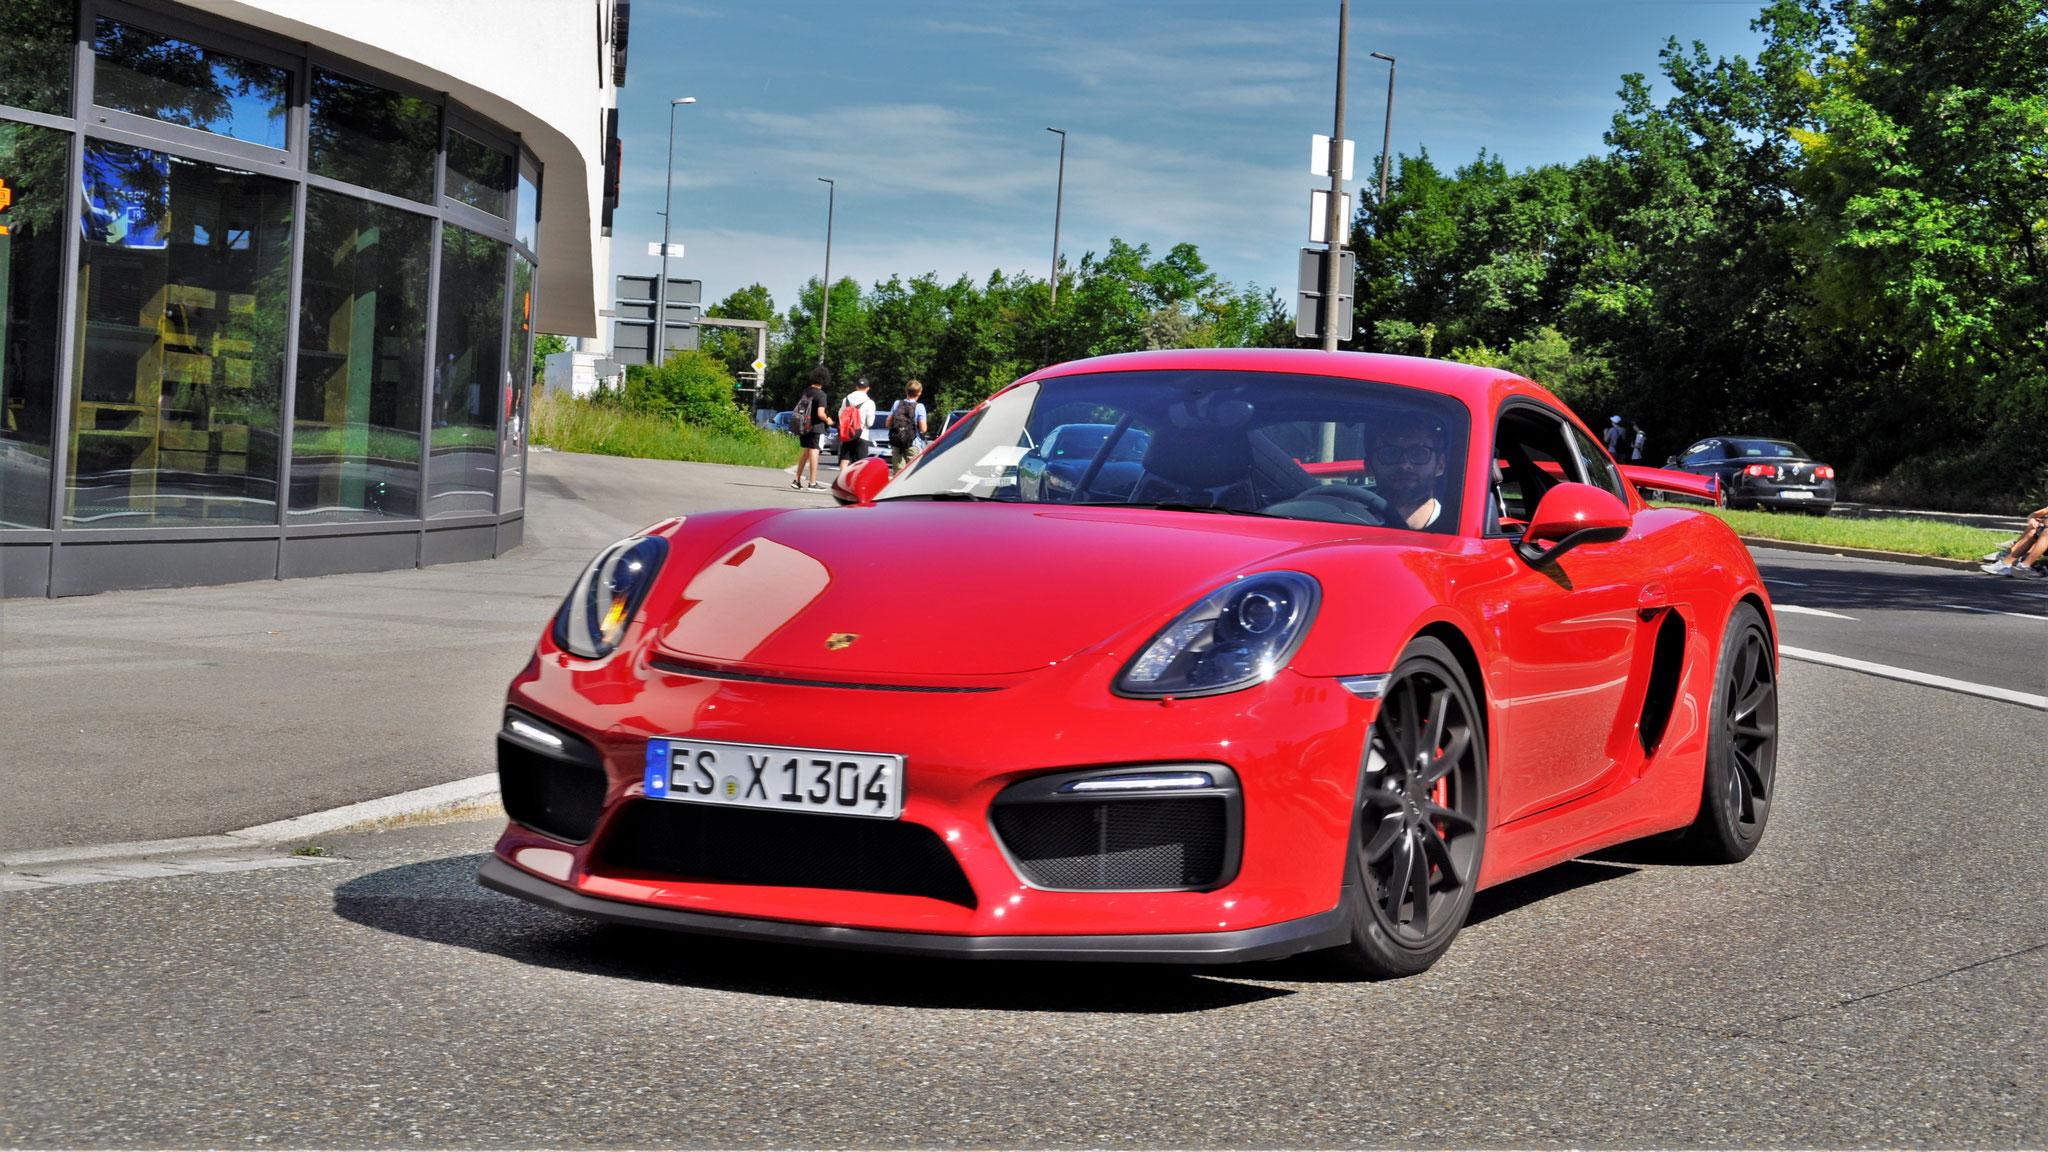 Porsche Cayman GT4 - ES-X-1304